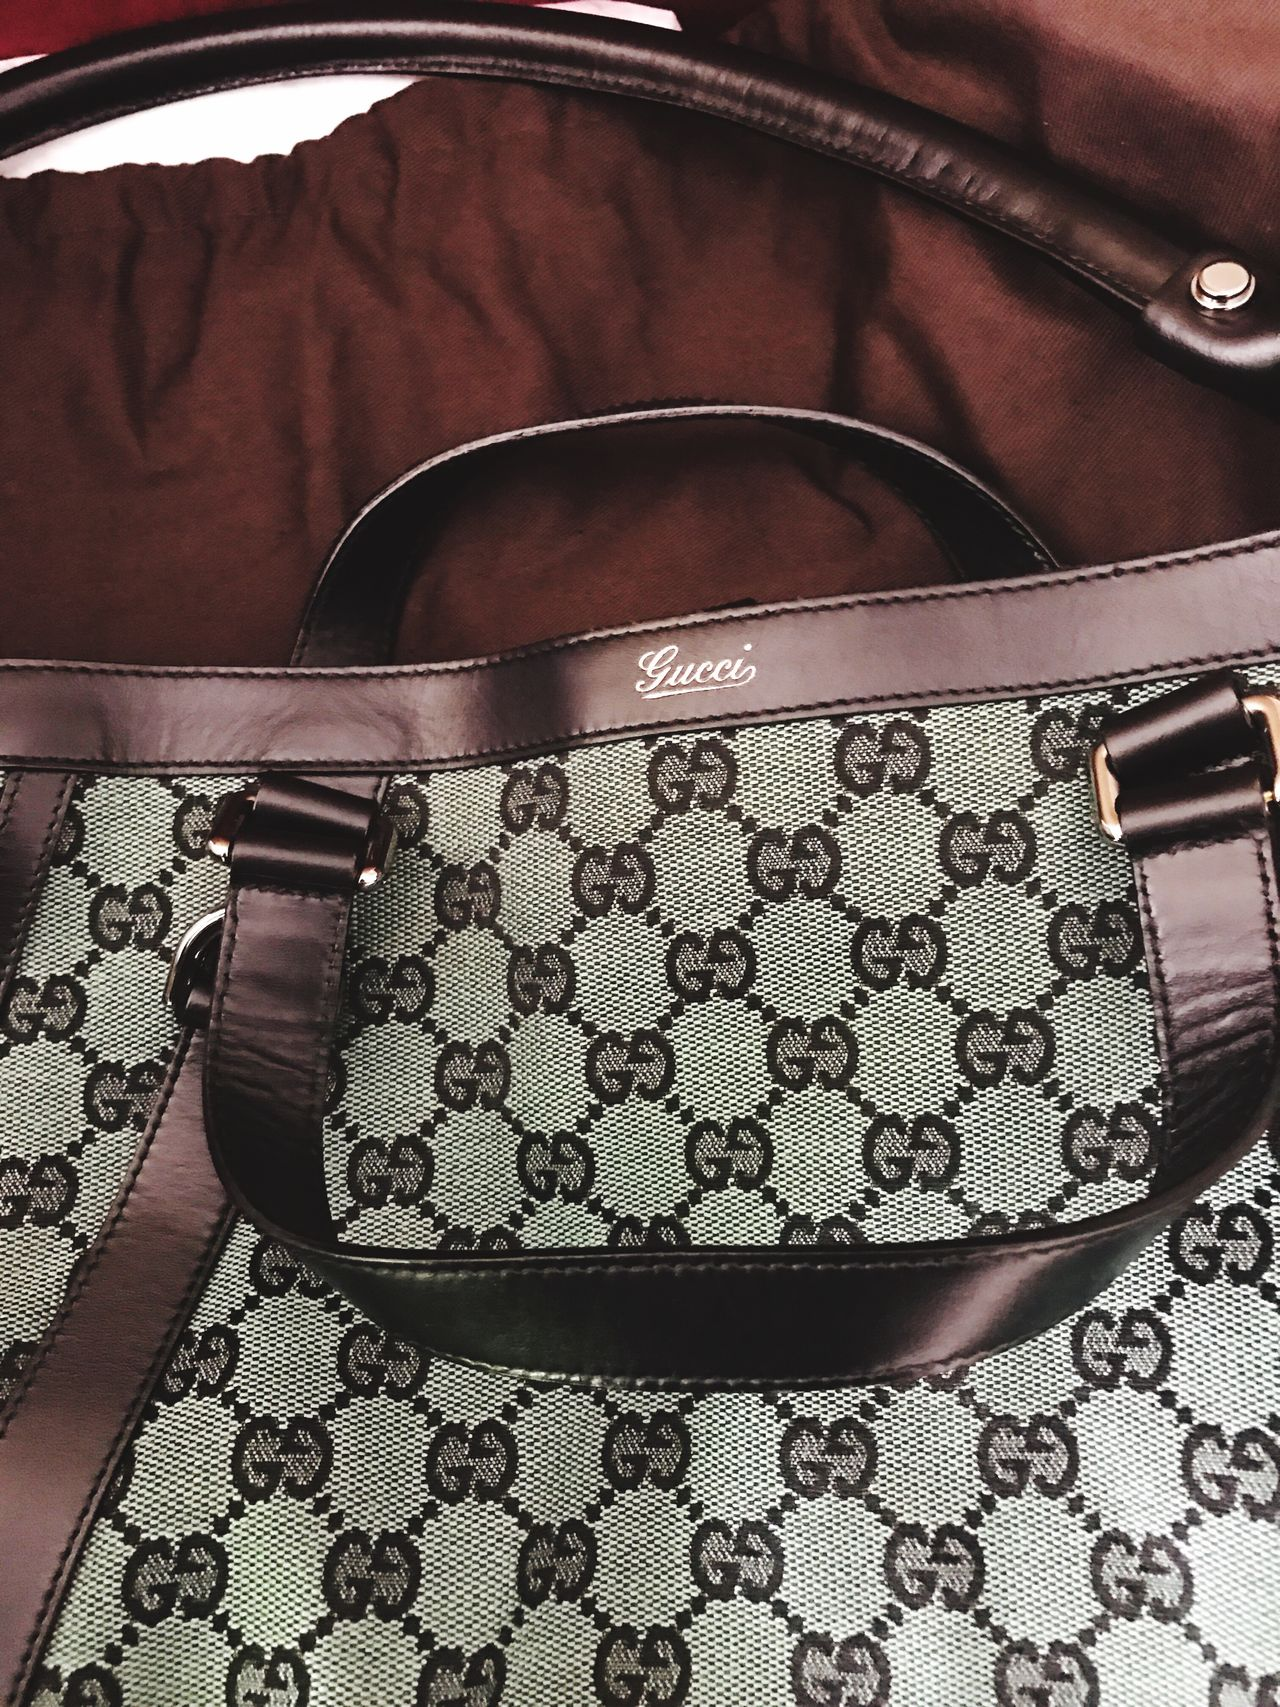 GUCCI Abbey Green Hobo.. Close-up Logo Handbag  Purse Highend Luxury EyeEmNewHere EyeEm Best Shots EyeEmNewHere